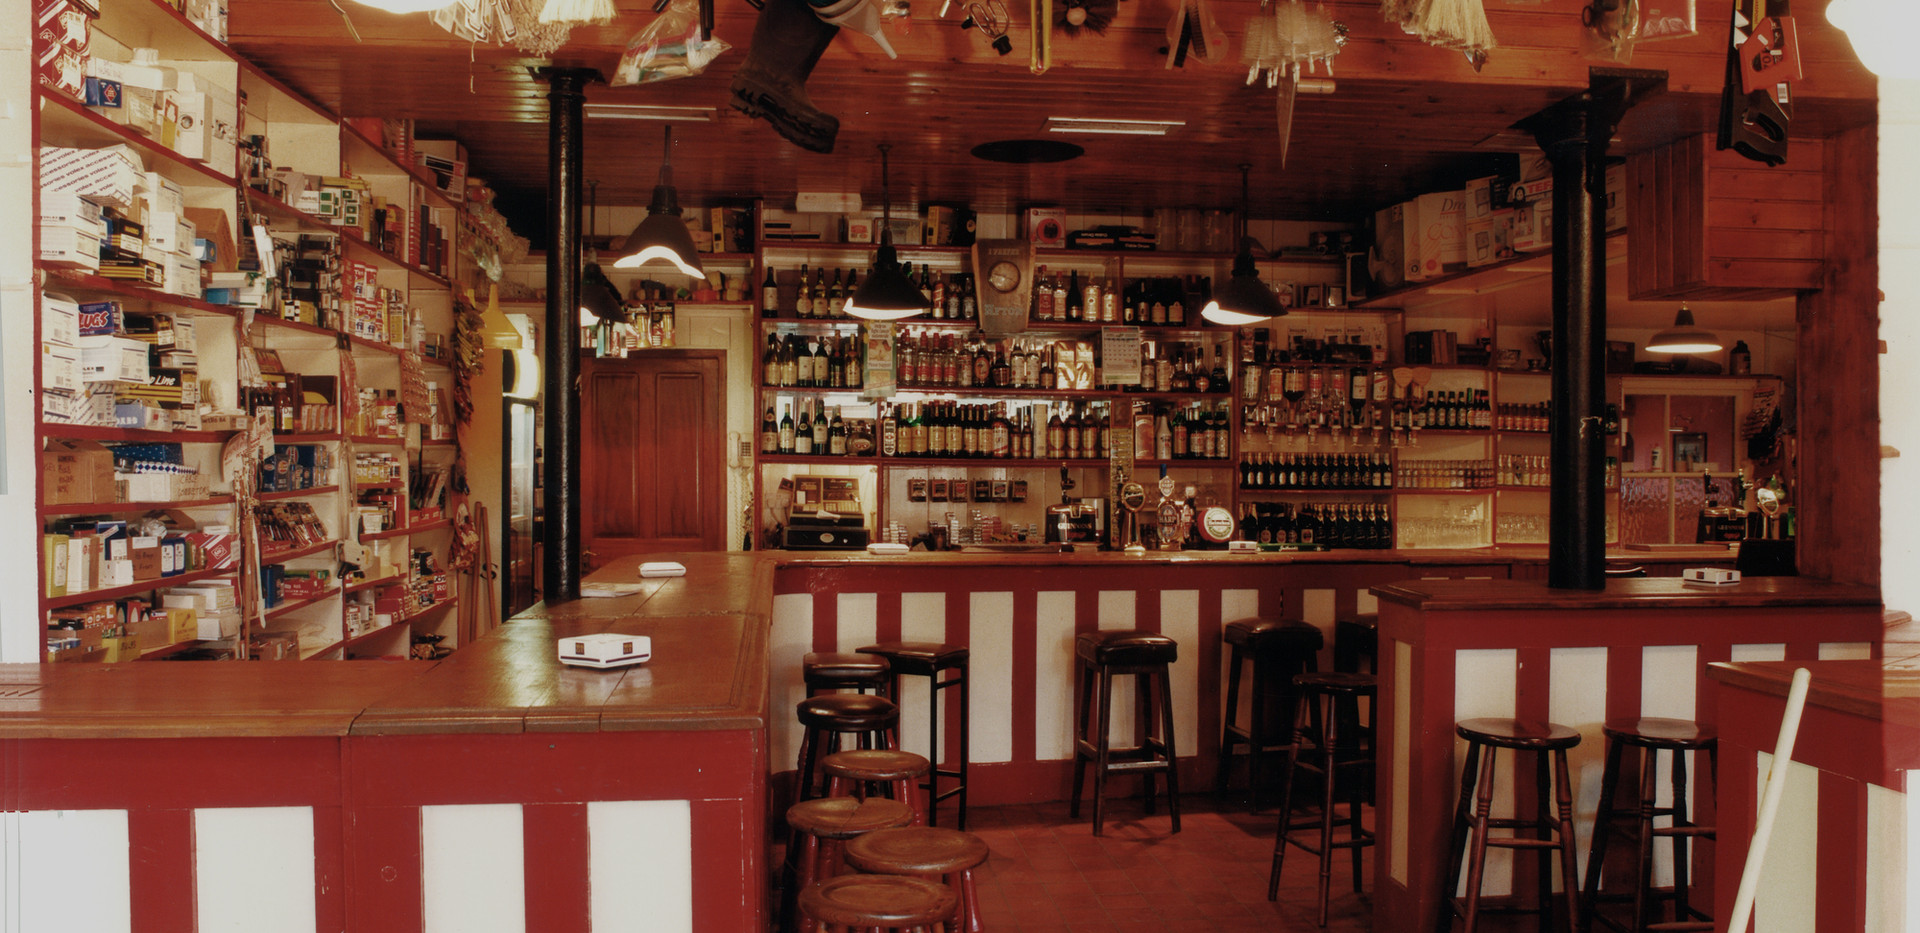 O'Shea's, Borris, Co. Carlow, restoration